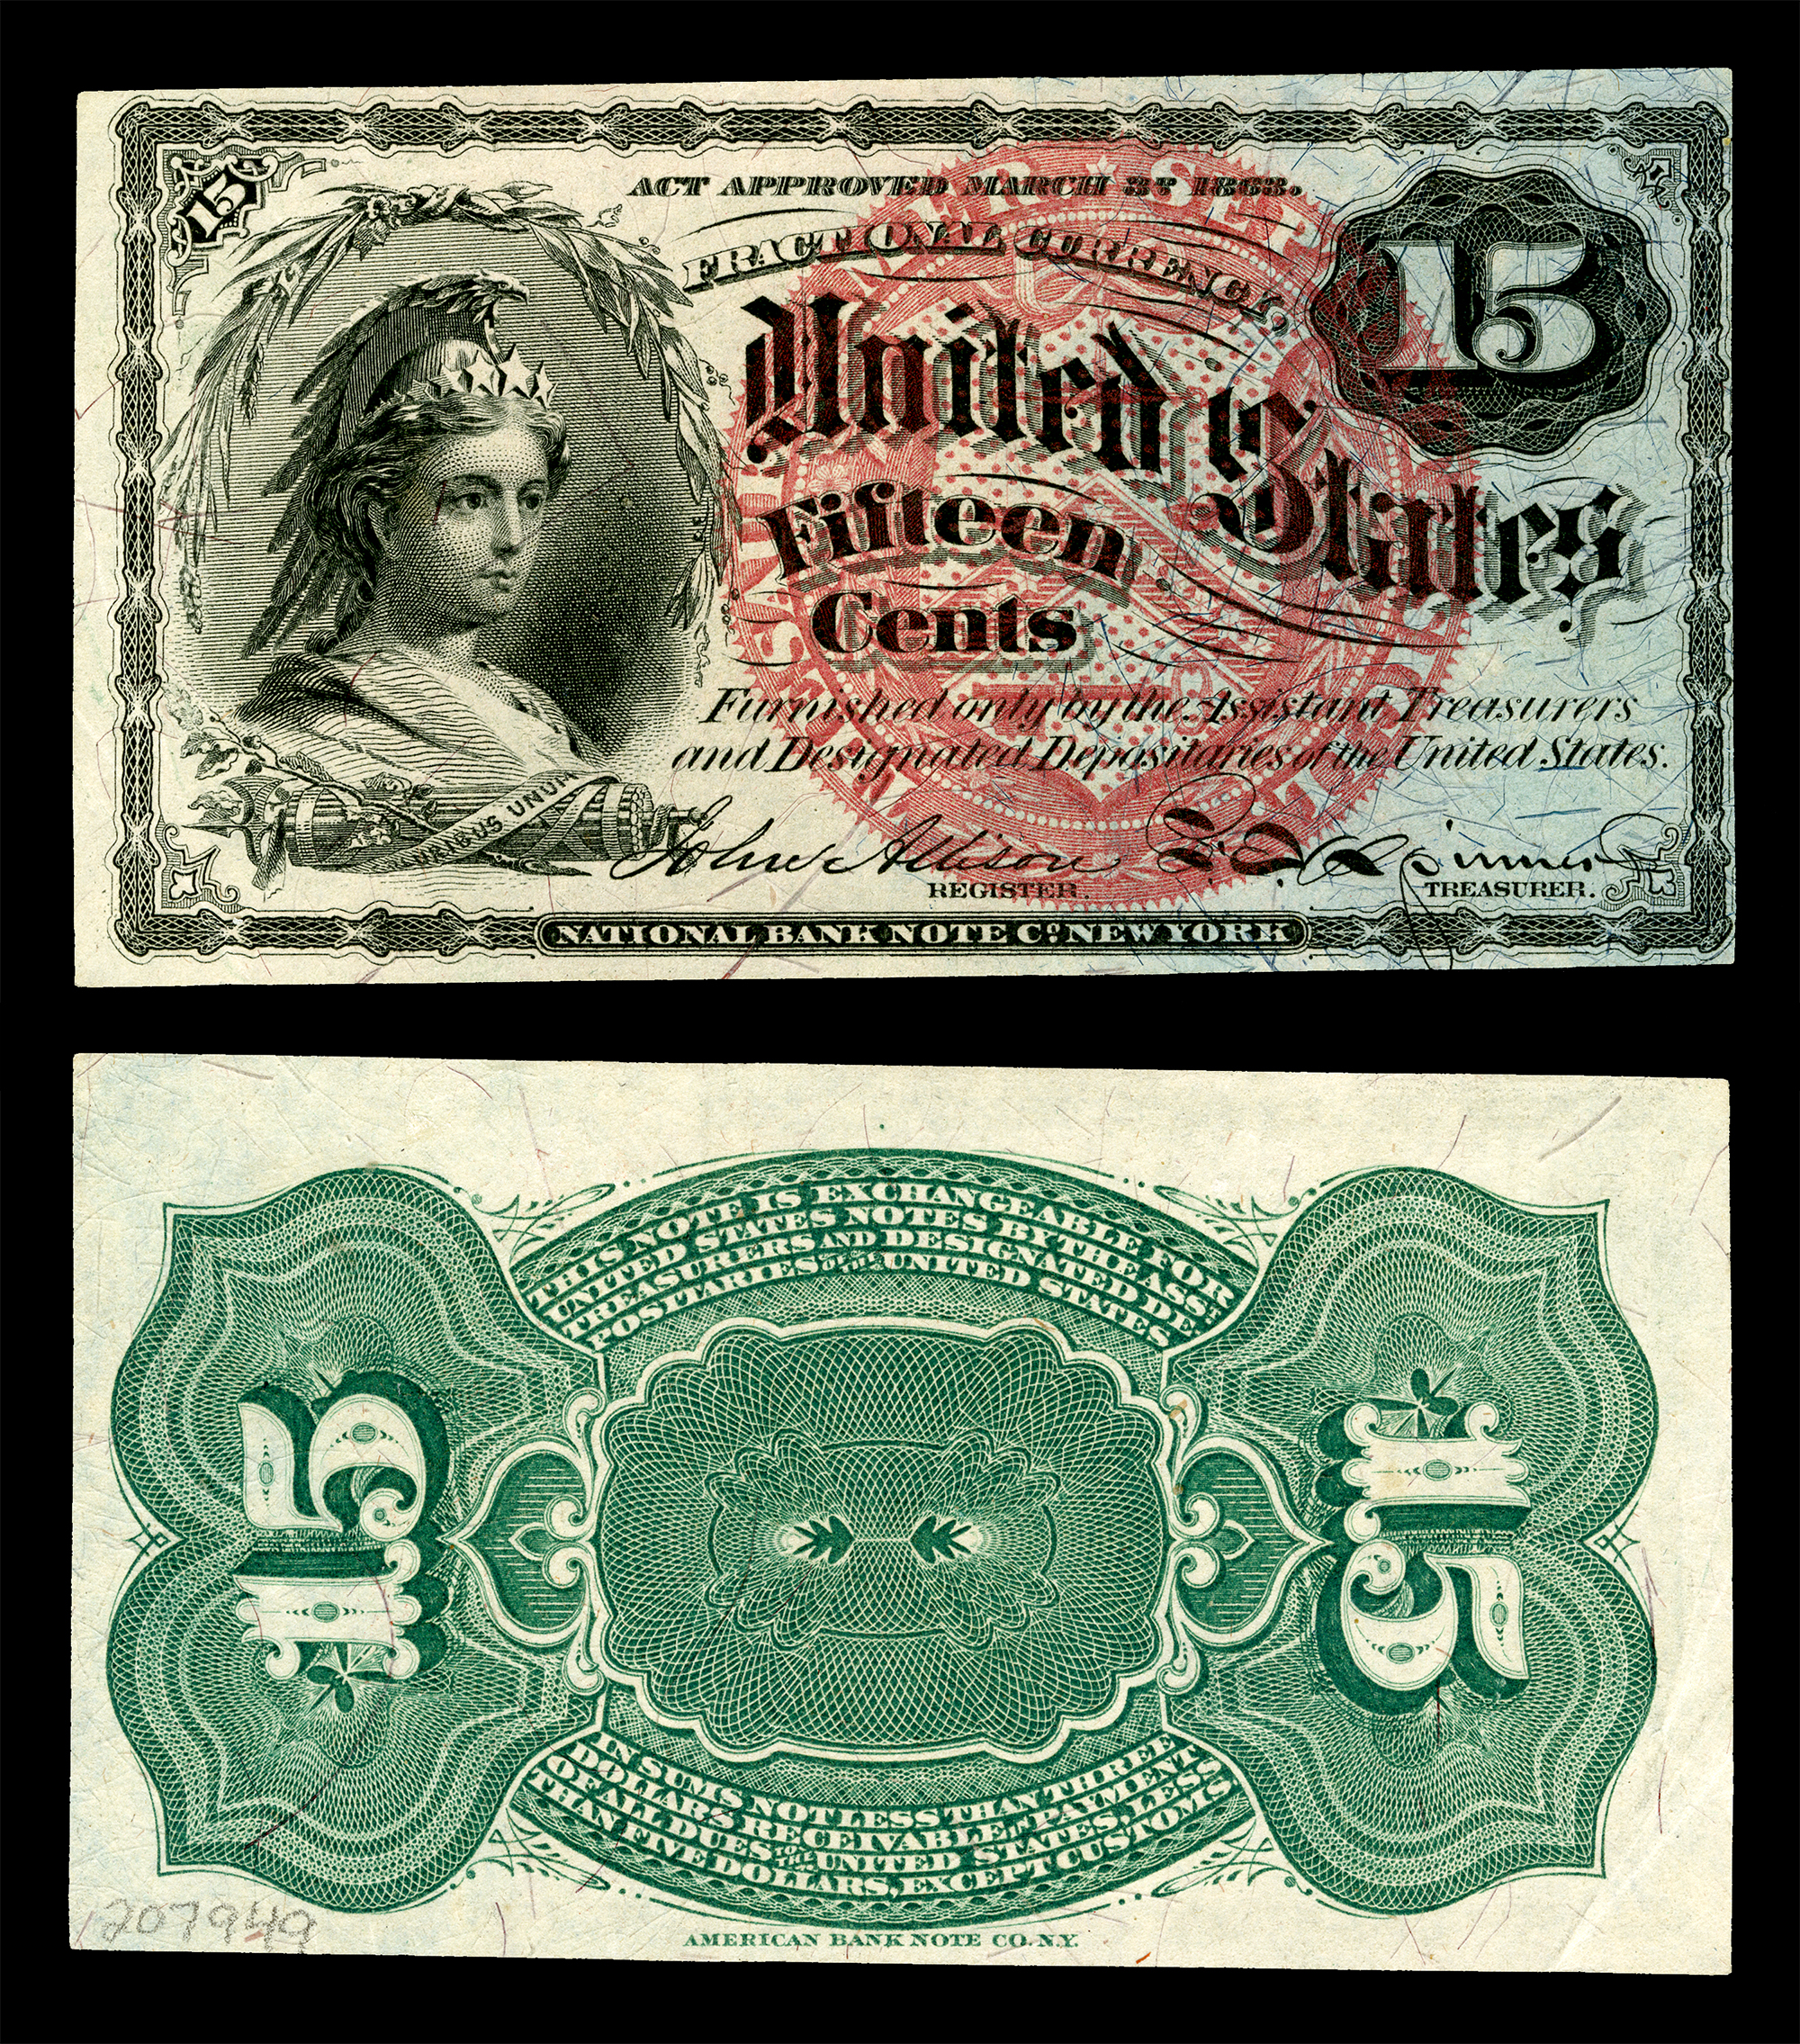 women on money image 1